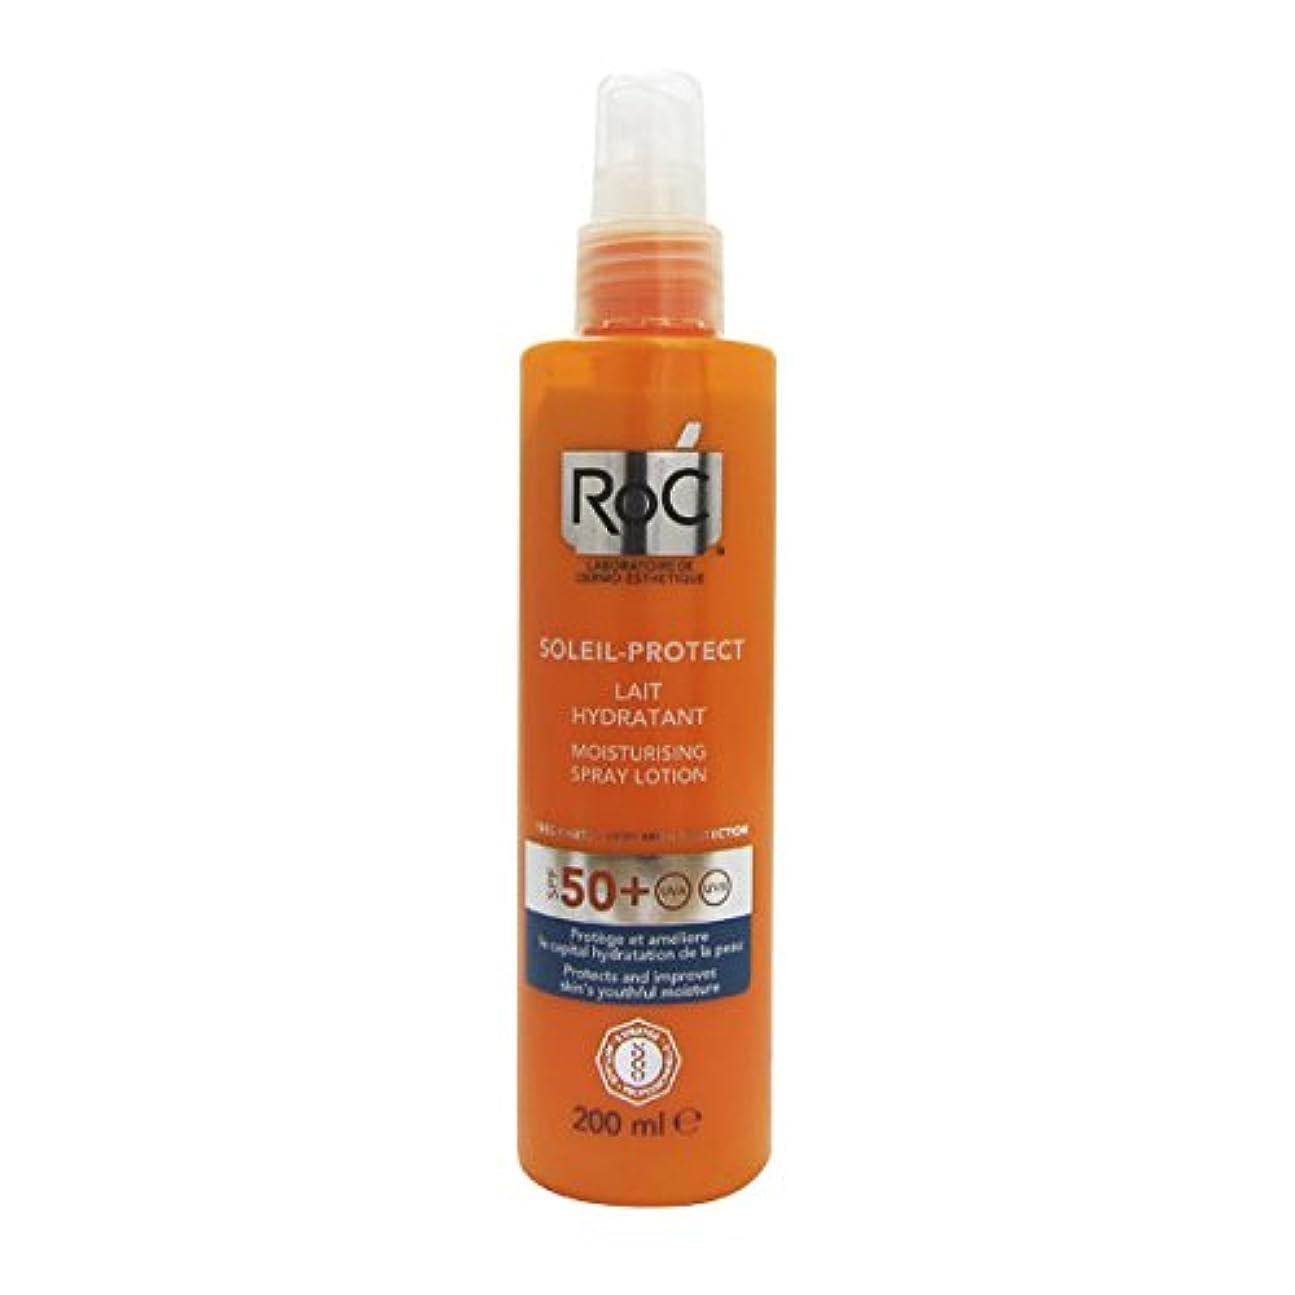 南欺南Roc Soleil Protect Hydrating Fluid Spf30 200ml [並行輸入品]